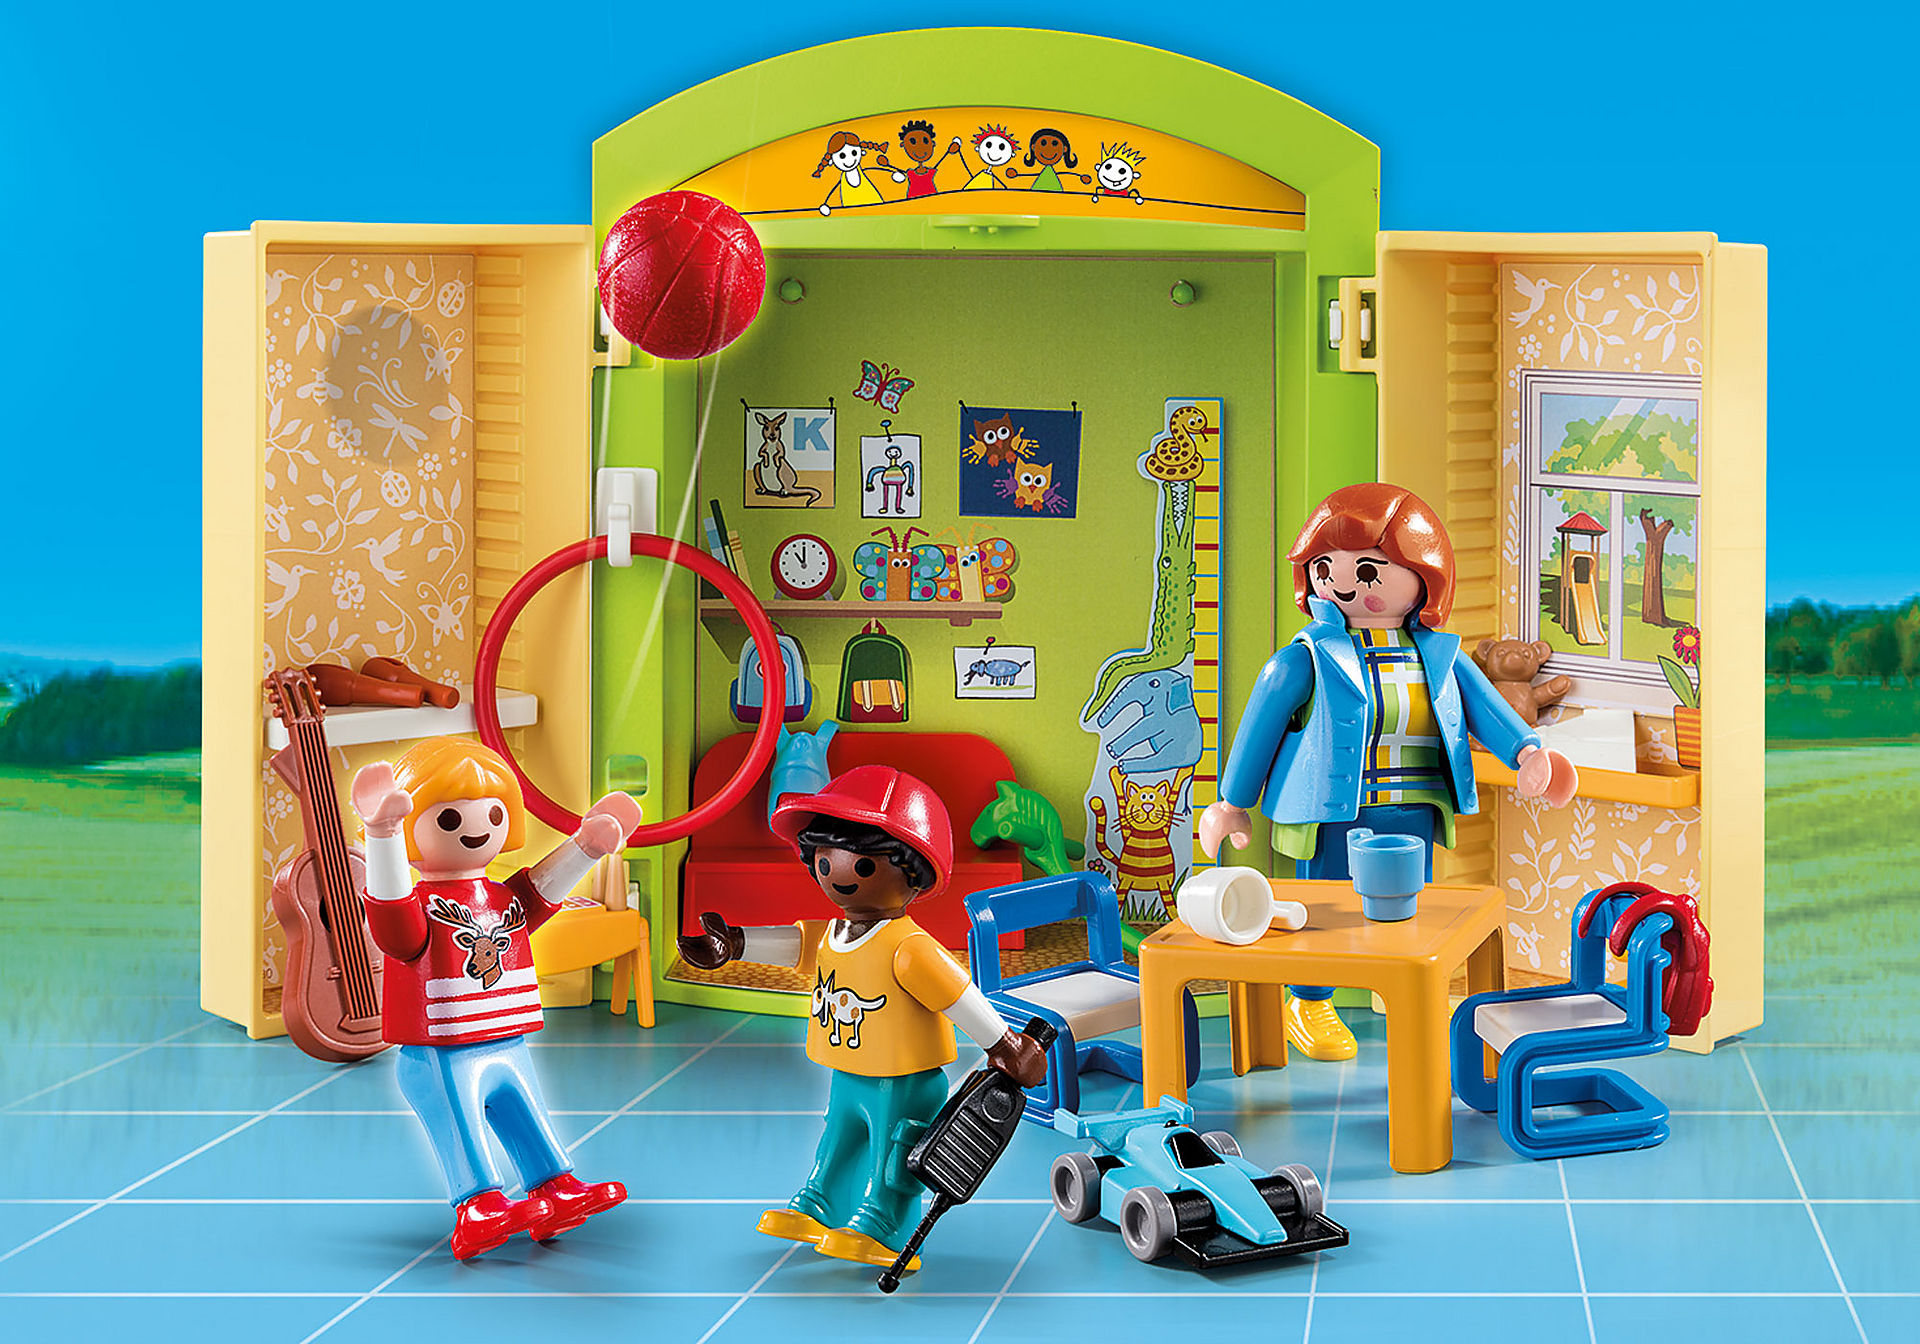 70308 Speelbox Kinderdagverblijf zoom image1